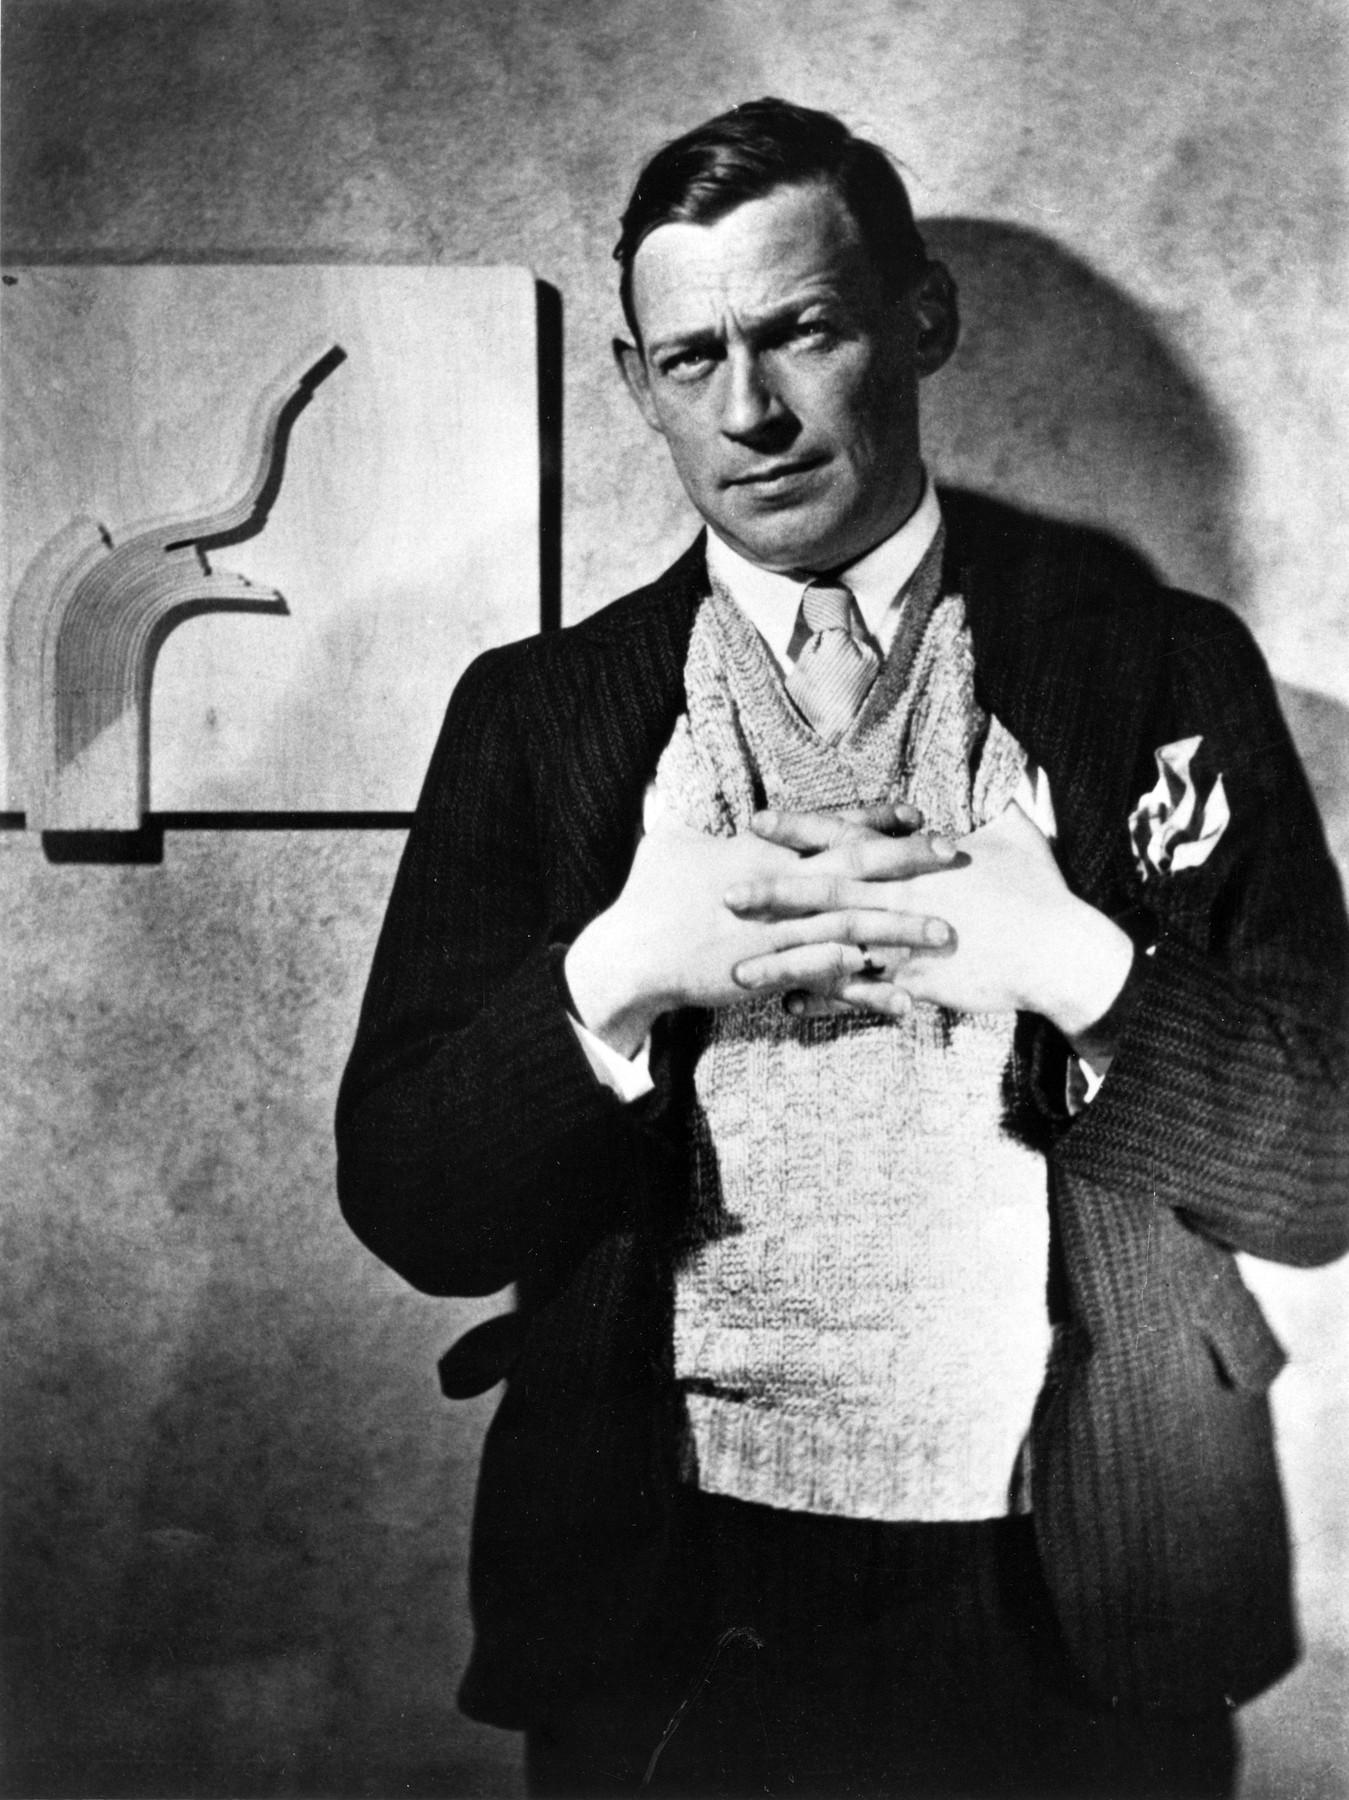 1834901 Alvar Aalto 3 bw master